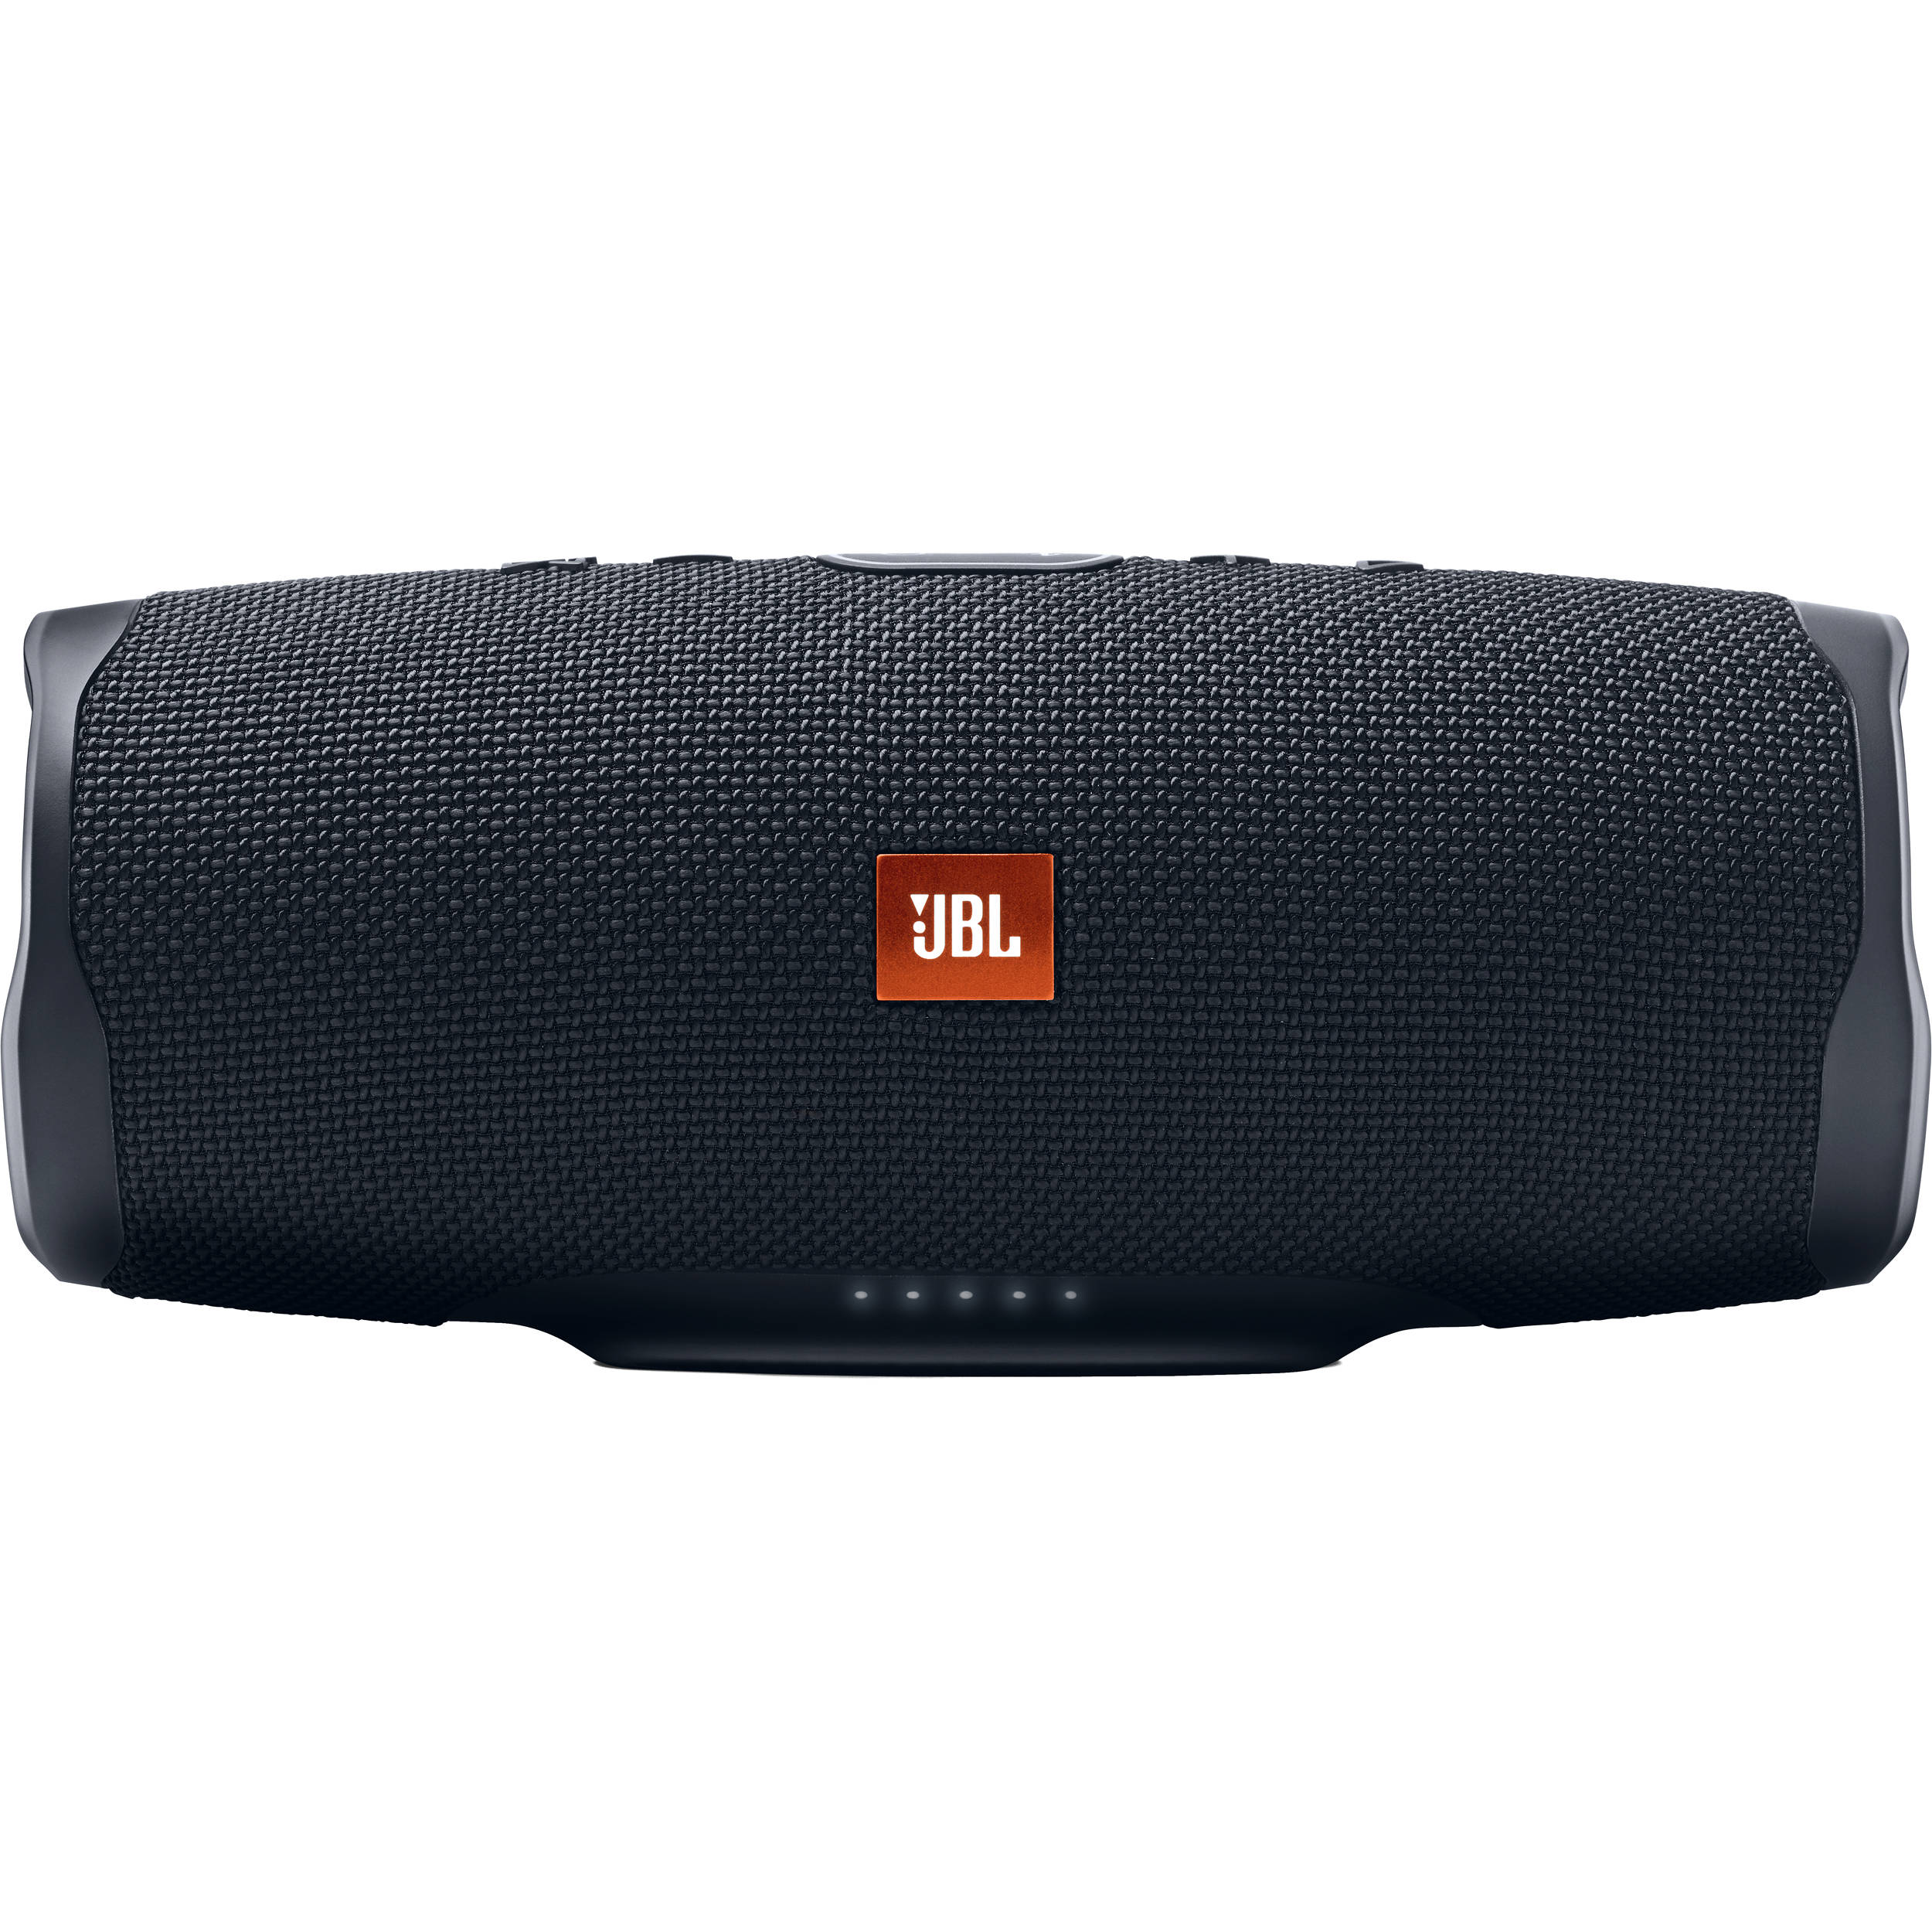 Jbl Charge 4 Portable Bluetooth Speaker Black Jblcharge4blkam